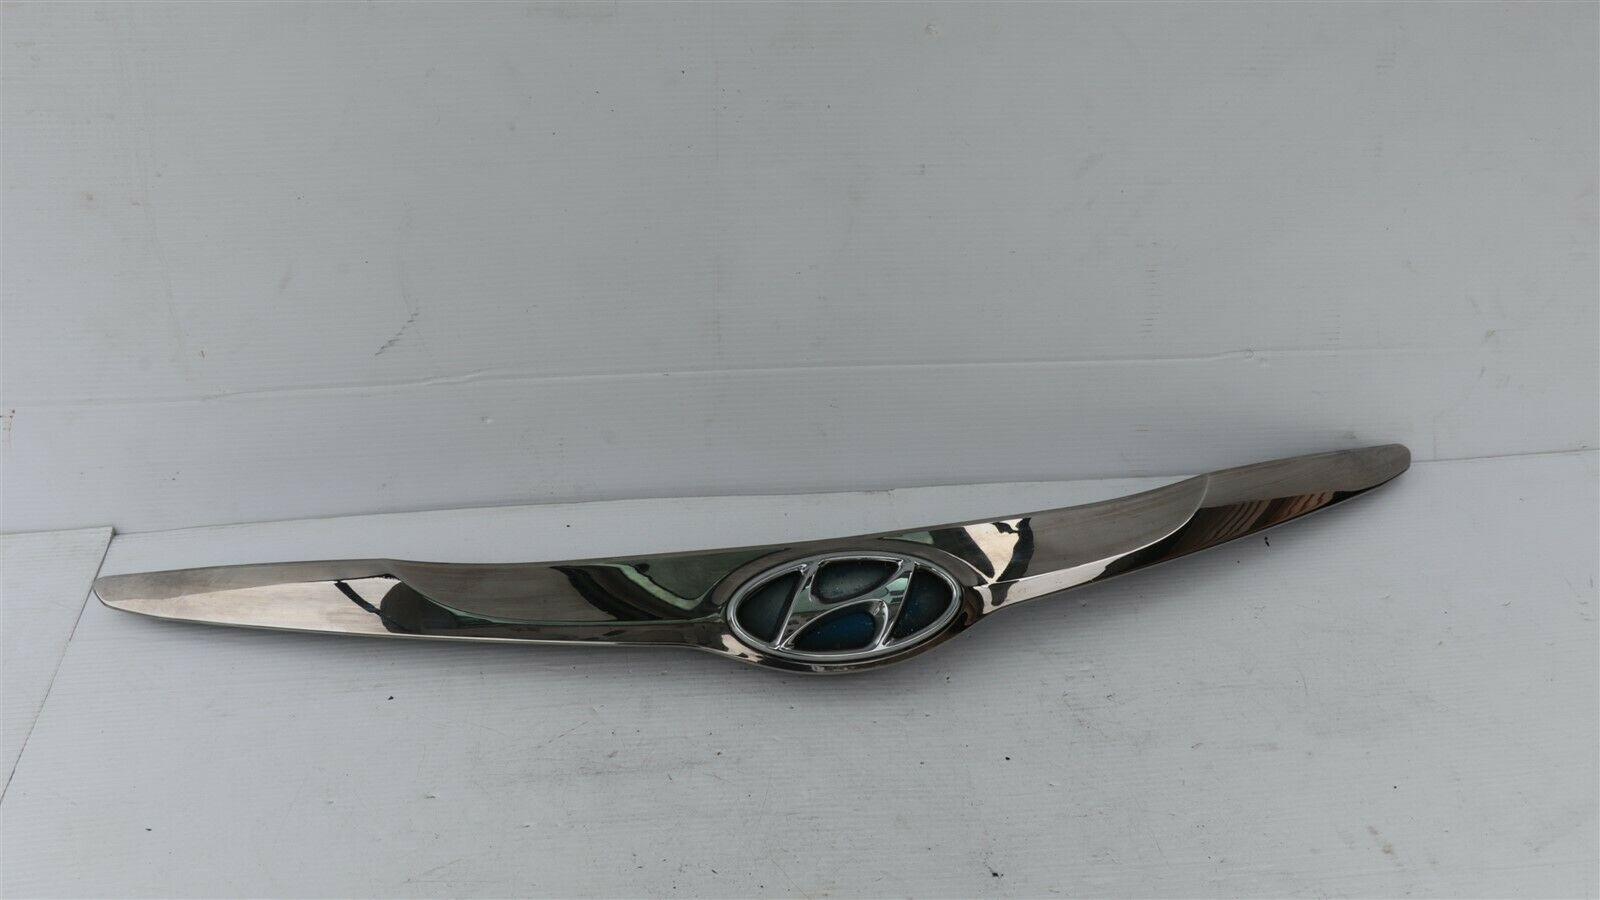 11-15 Hyundai Sonata Hybrid Hood Garnish Upper Grille Chrome Molding 86356-4R000